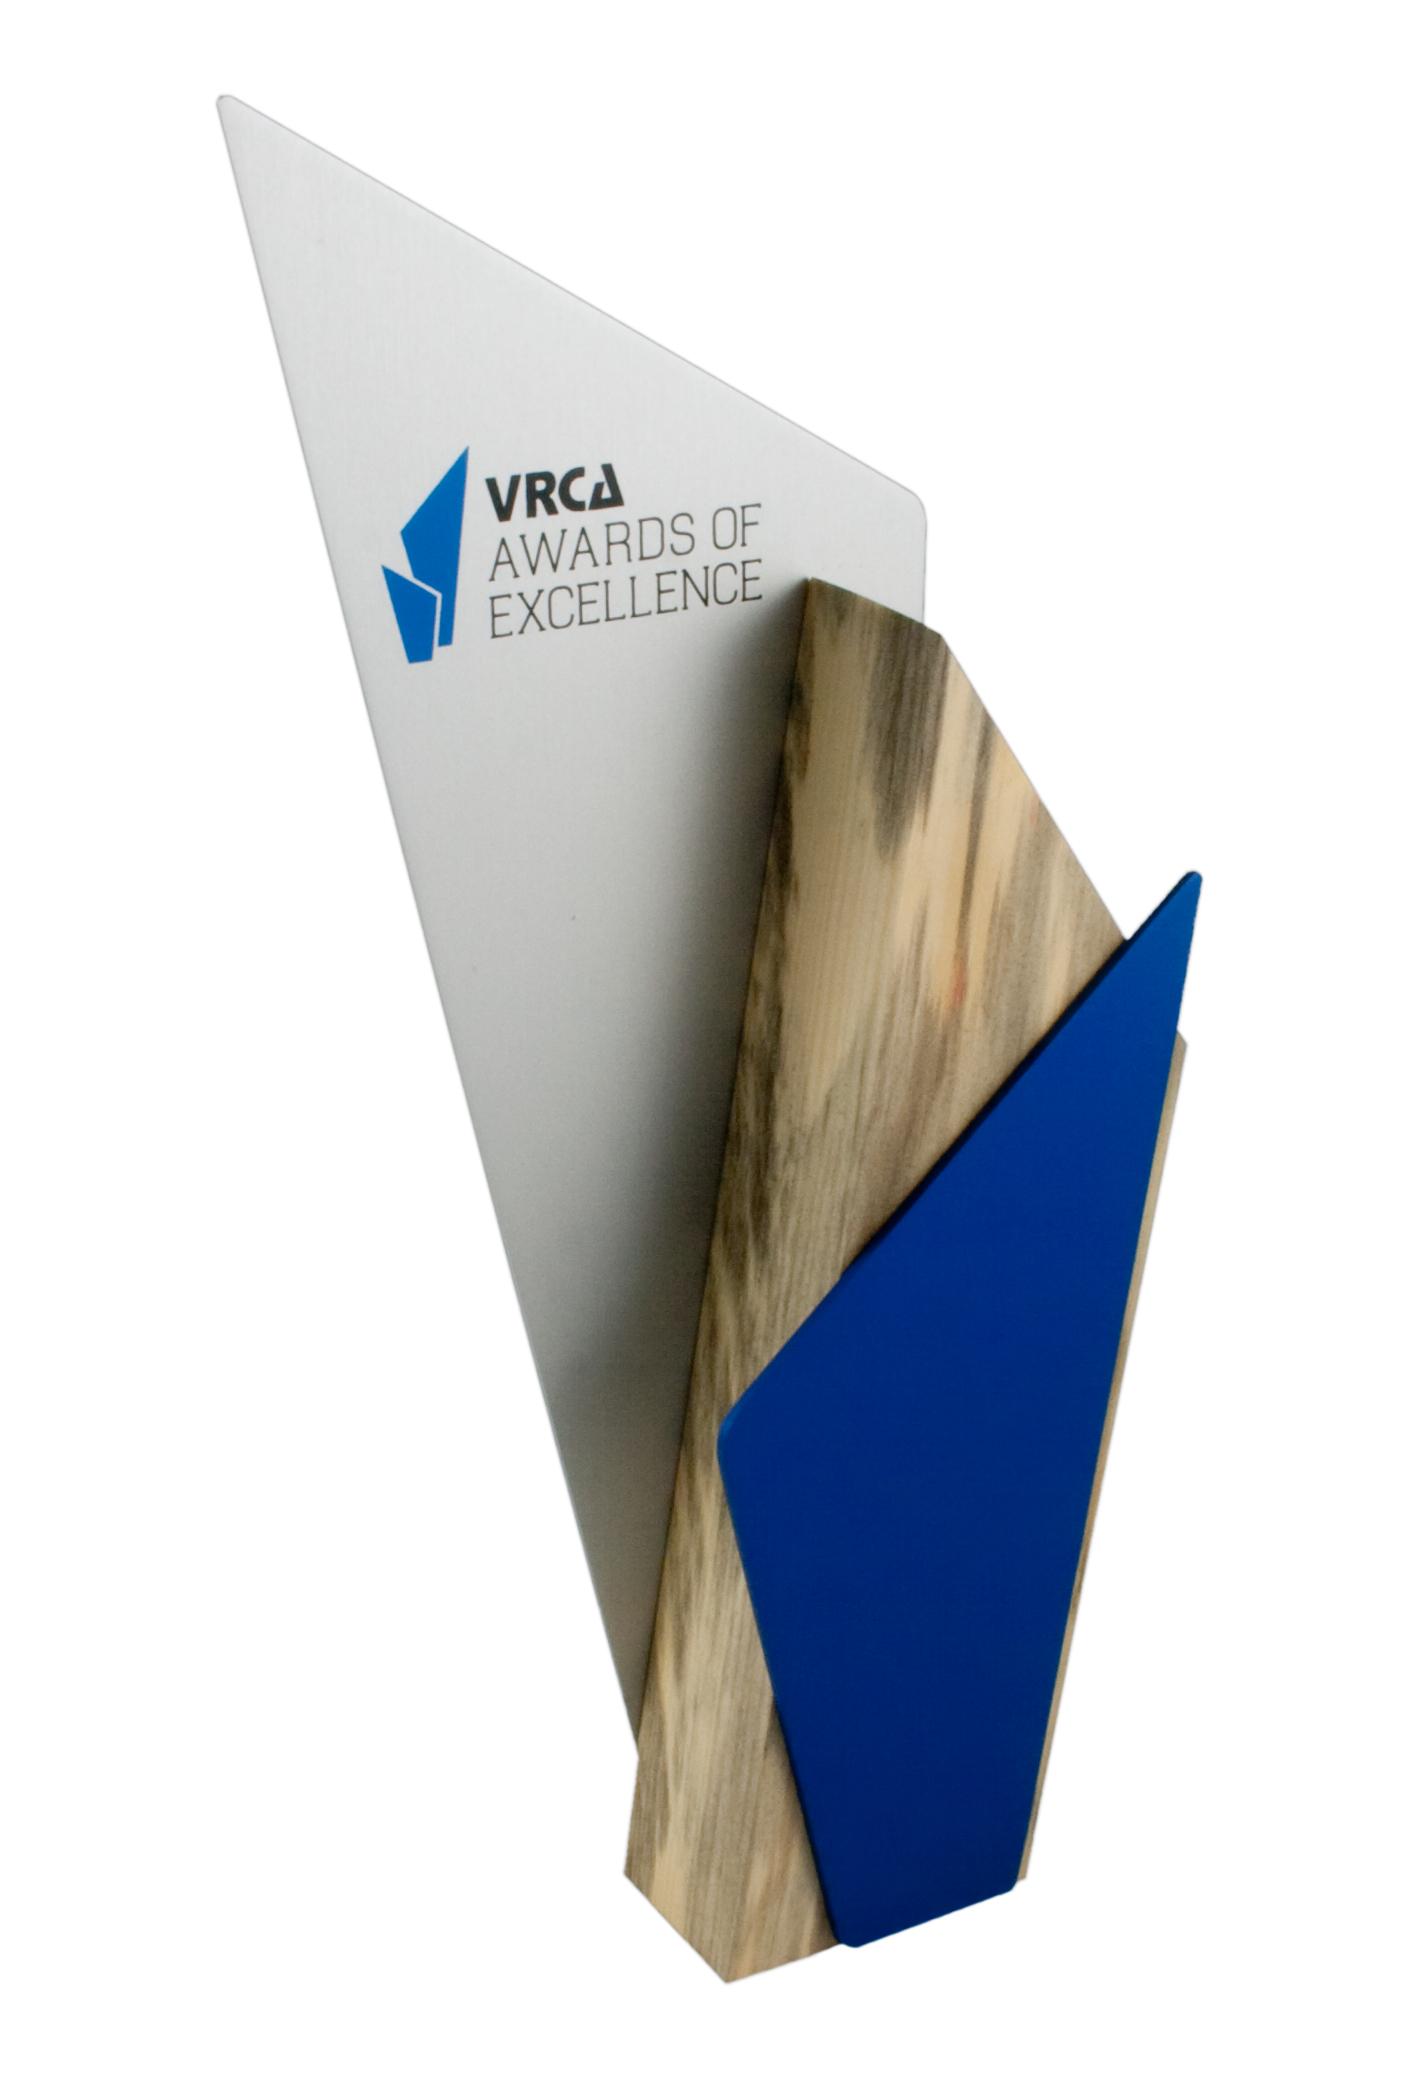 VRCA Awards of Excellence - Custom Award Design